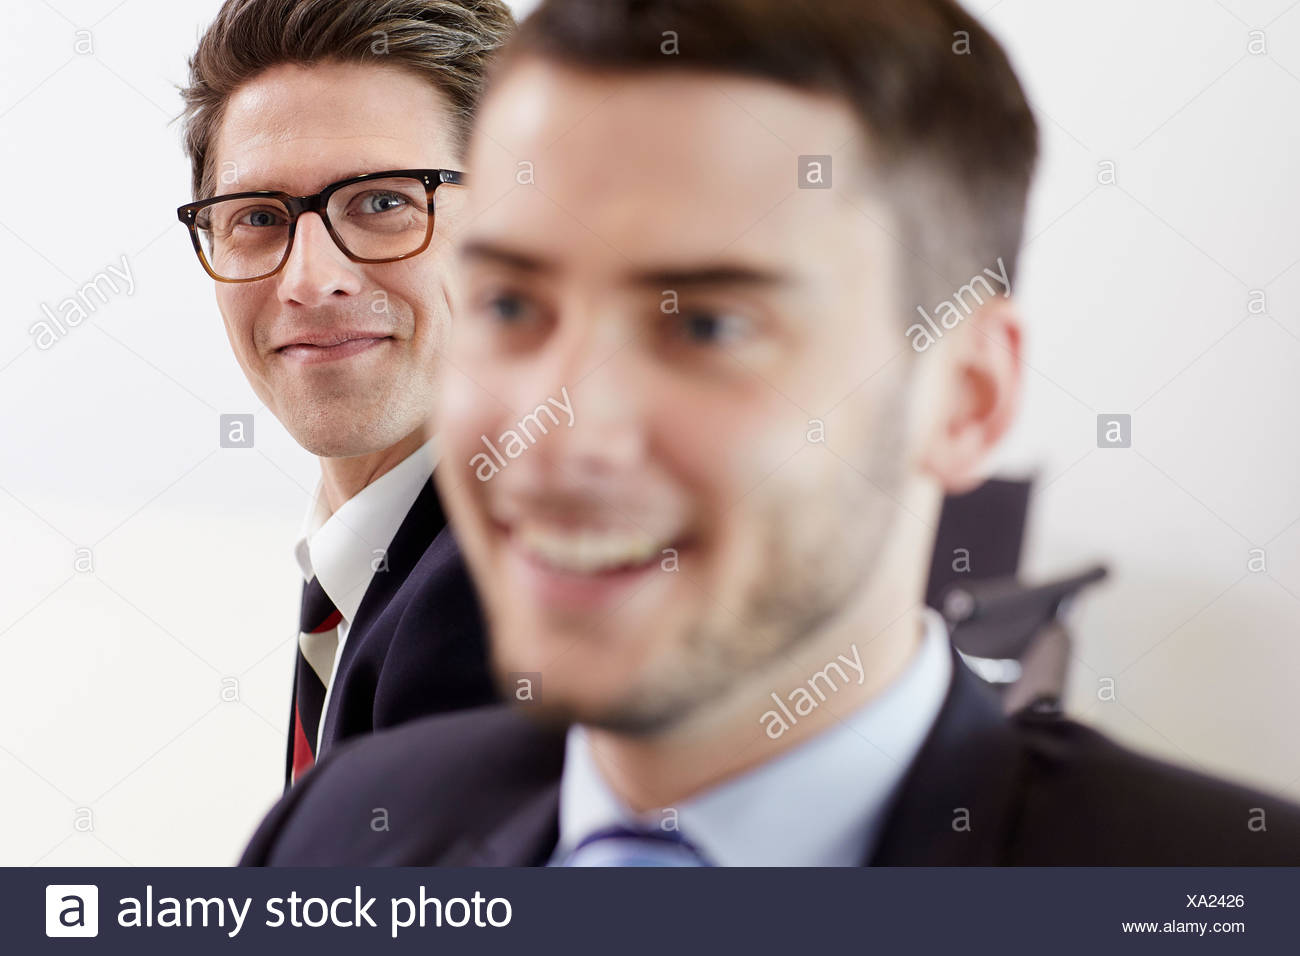 Headshot of businessmen smiling - Stock Image